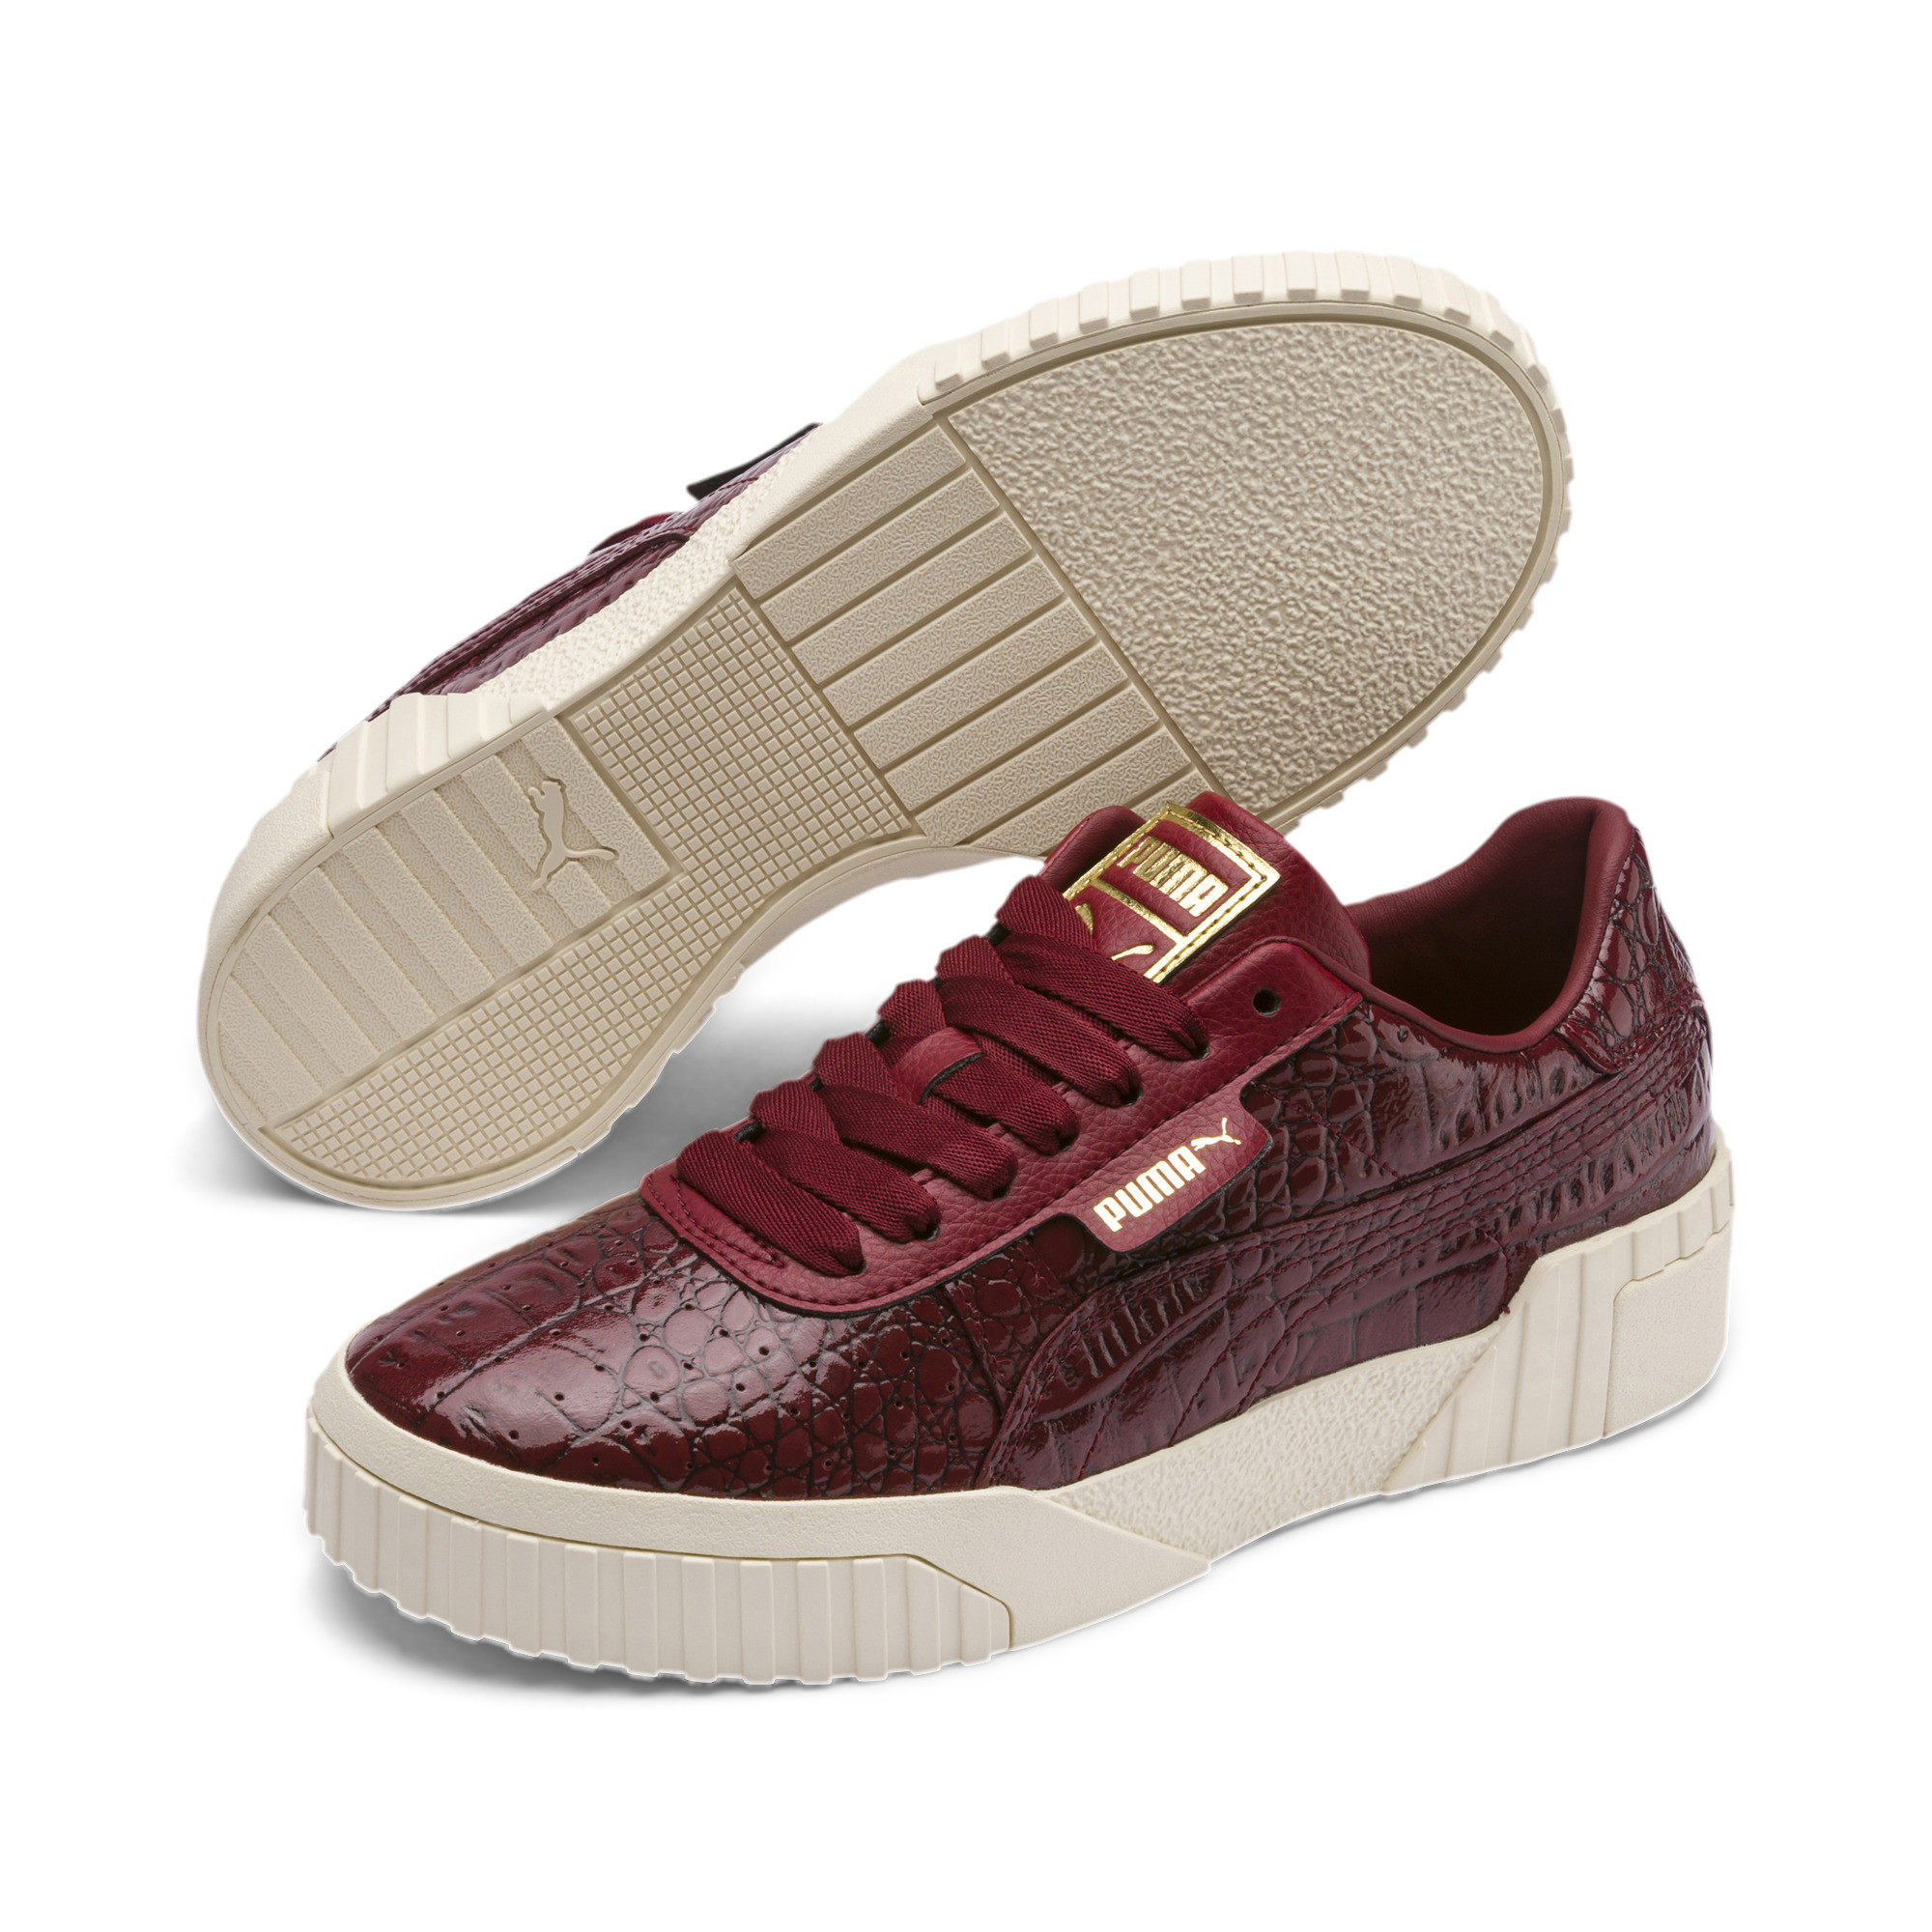 Image Puma Cali Croc Women's Sneakers #3